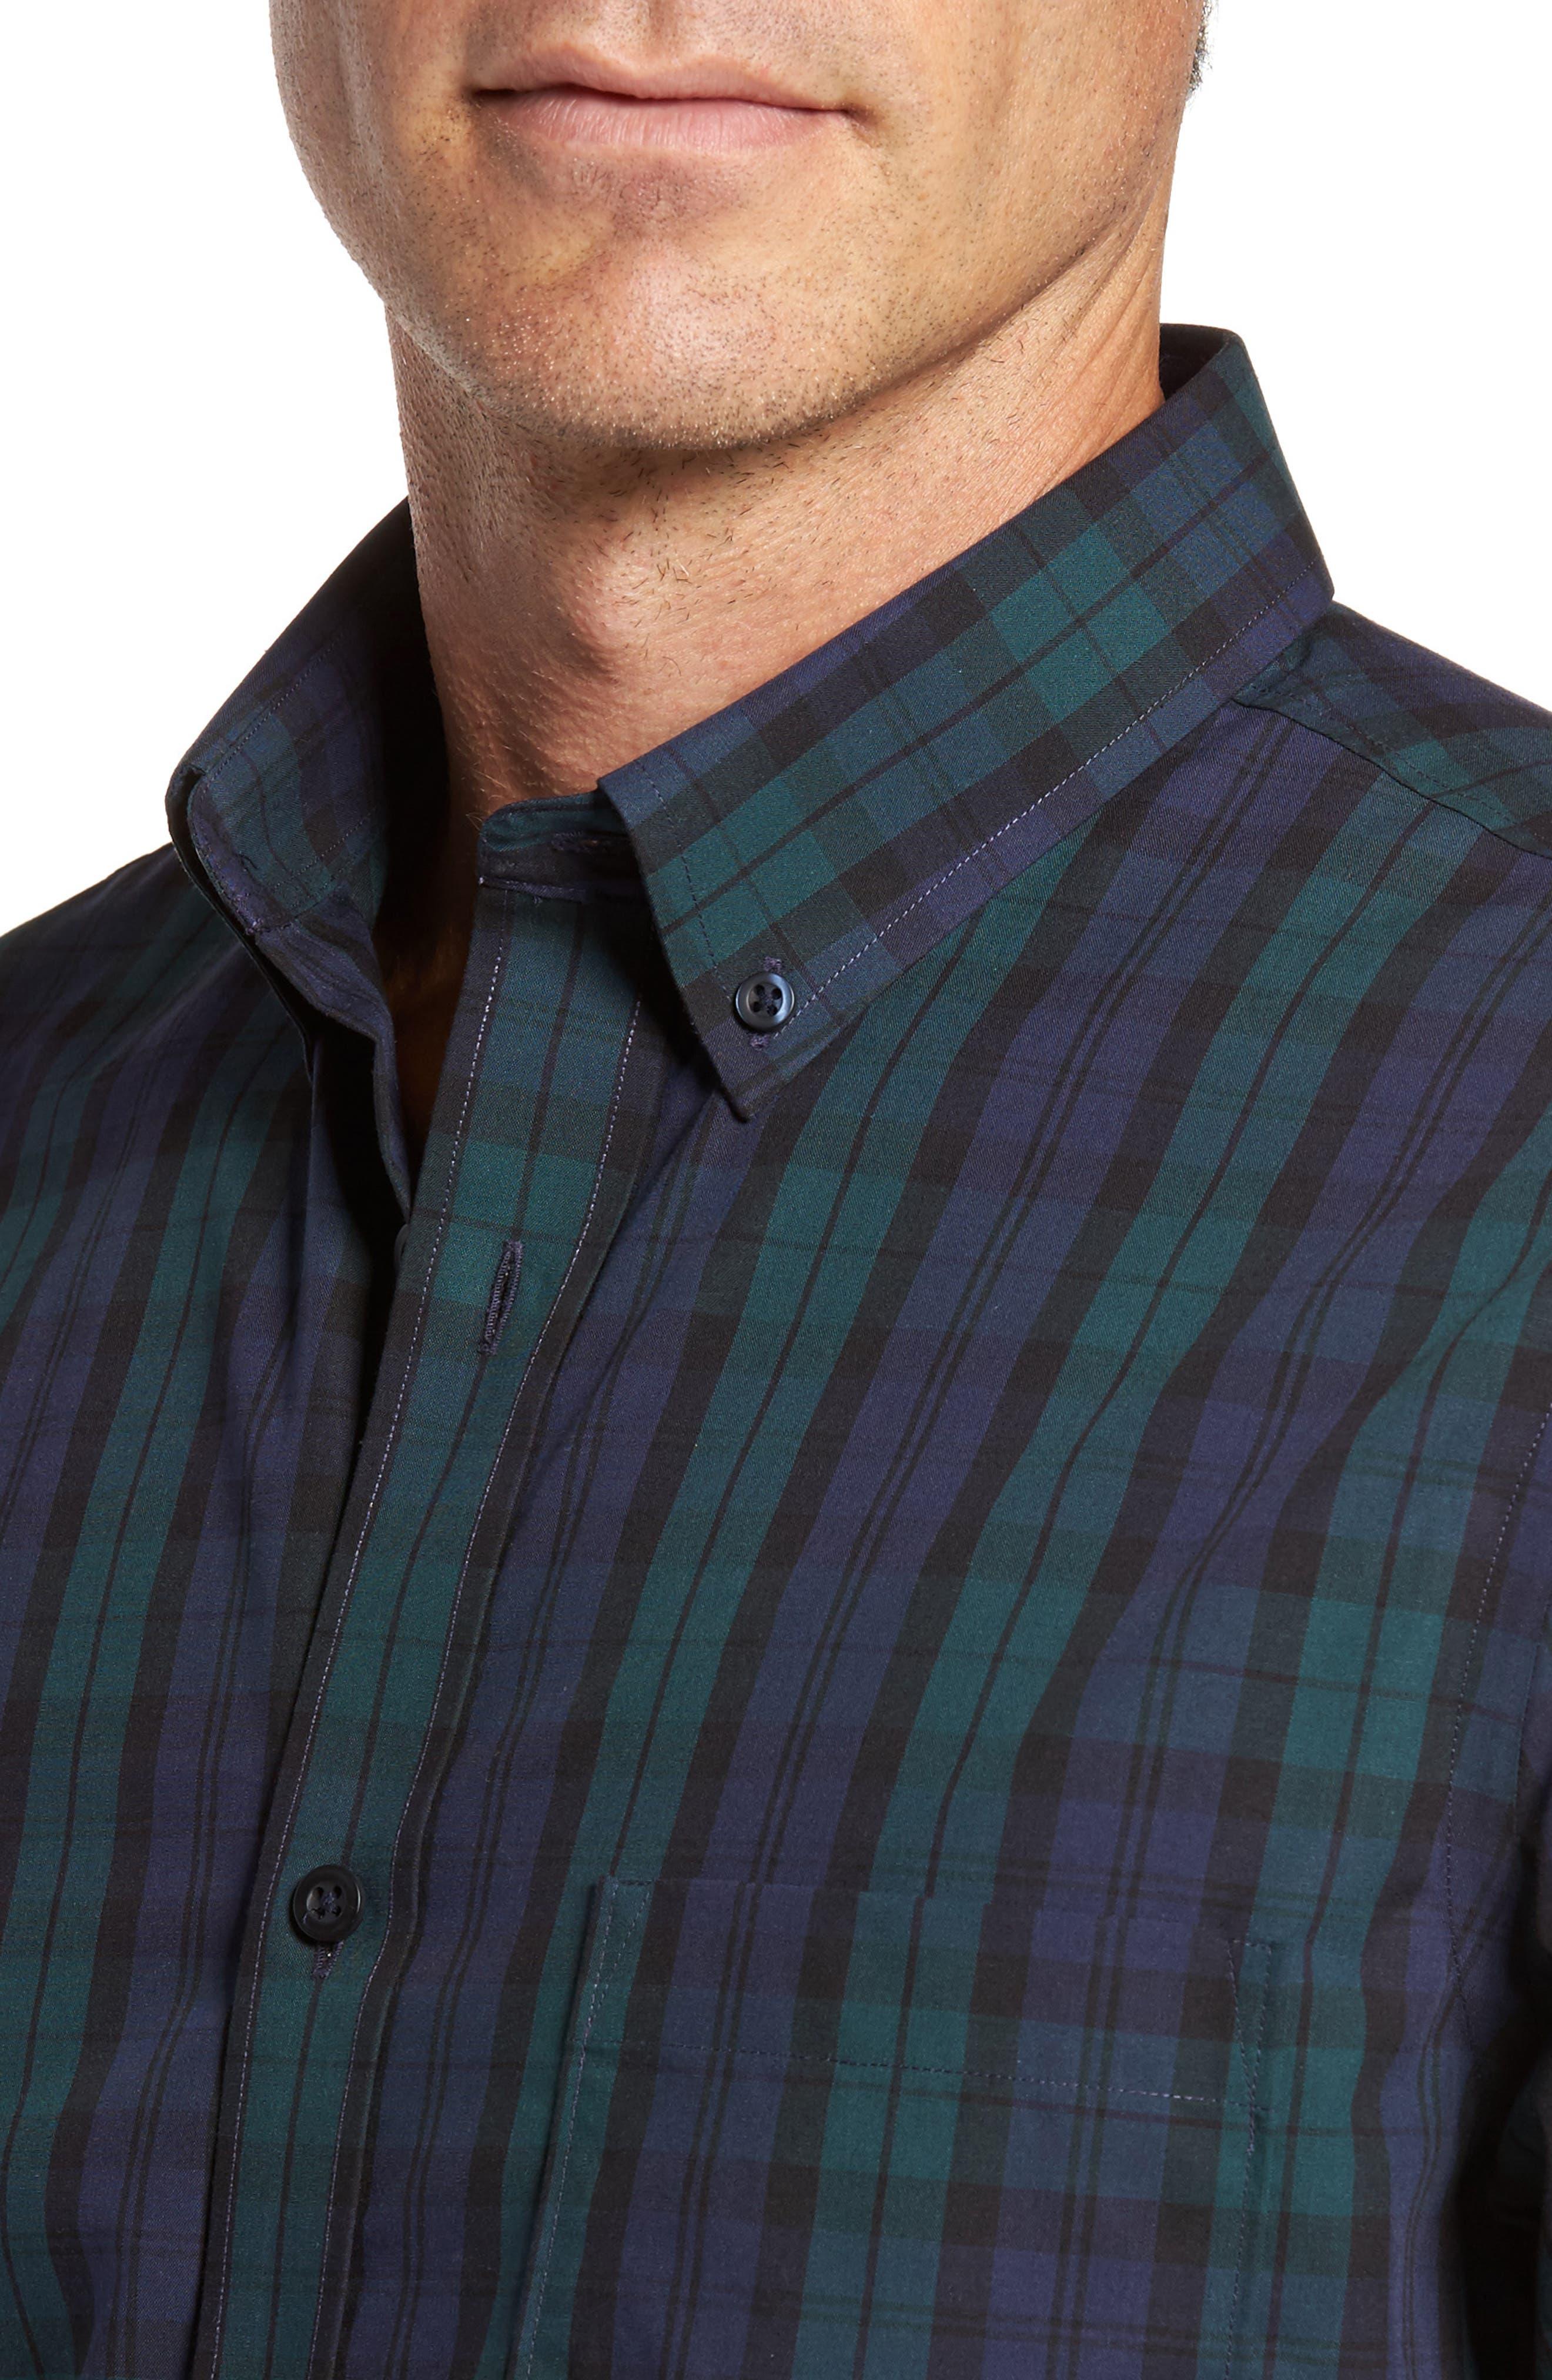 Regular Fit Non-Iron Plaid Sport Shirt,                             Alternate thumbnail 4, color,                             Green Bug Navy Tartan